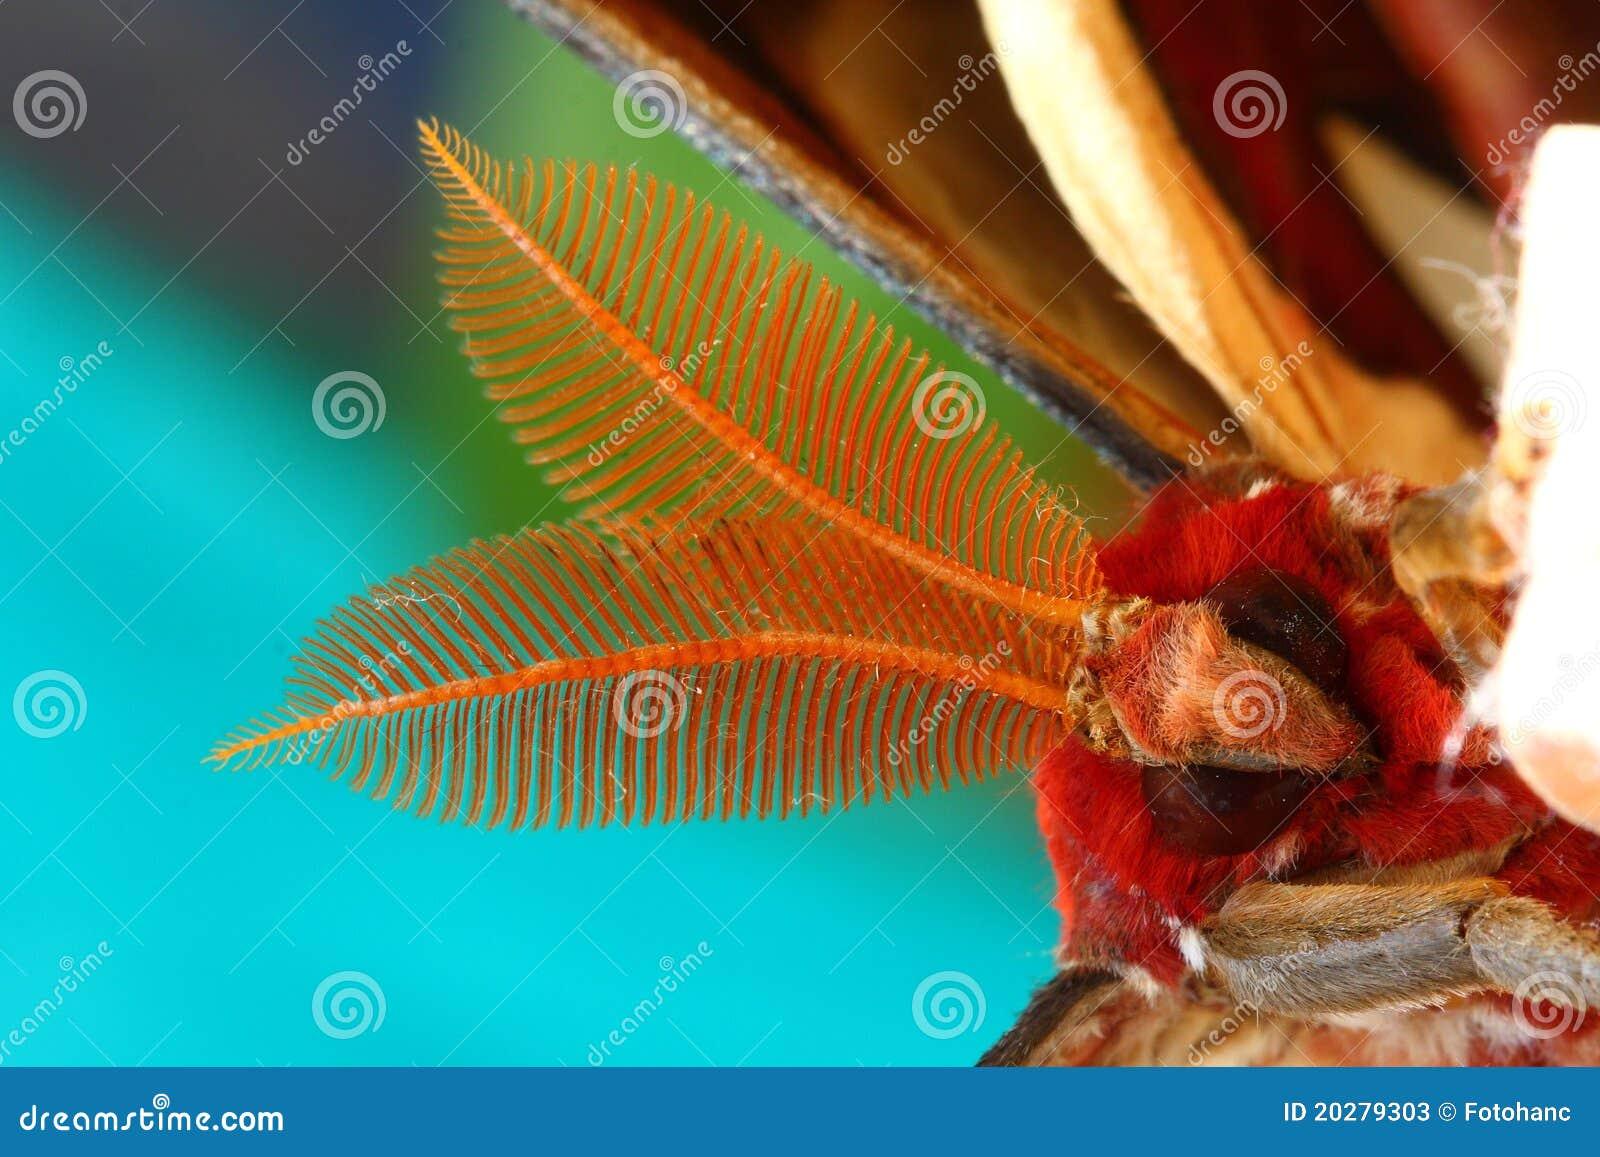 Face of Atlas Moth (Attacus atlas)